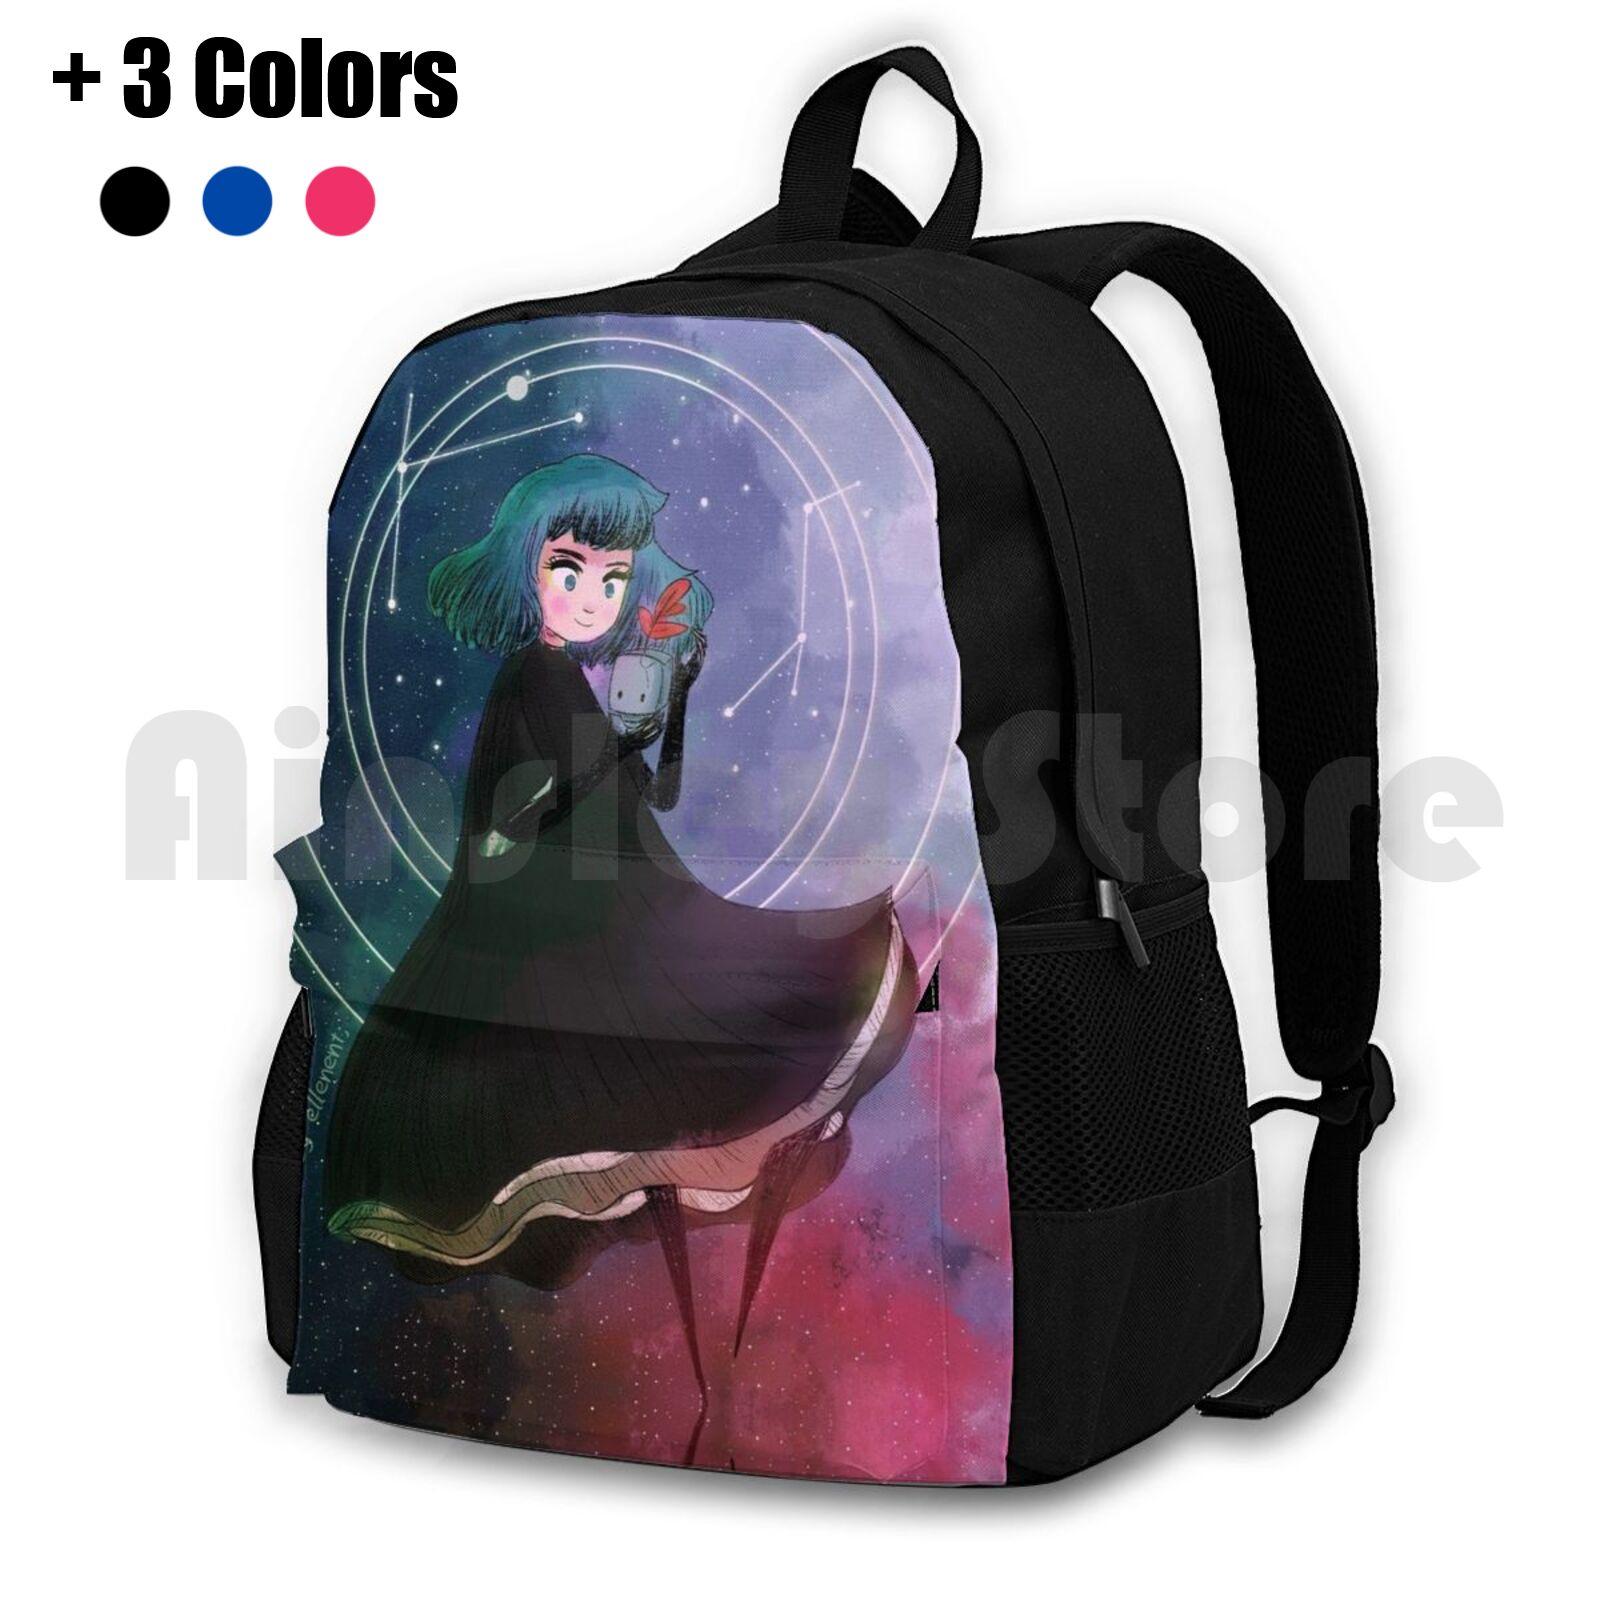 Gris-mochila de senderismo al aire libre para niñas, bolsa de viaje para...